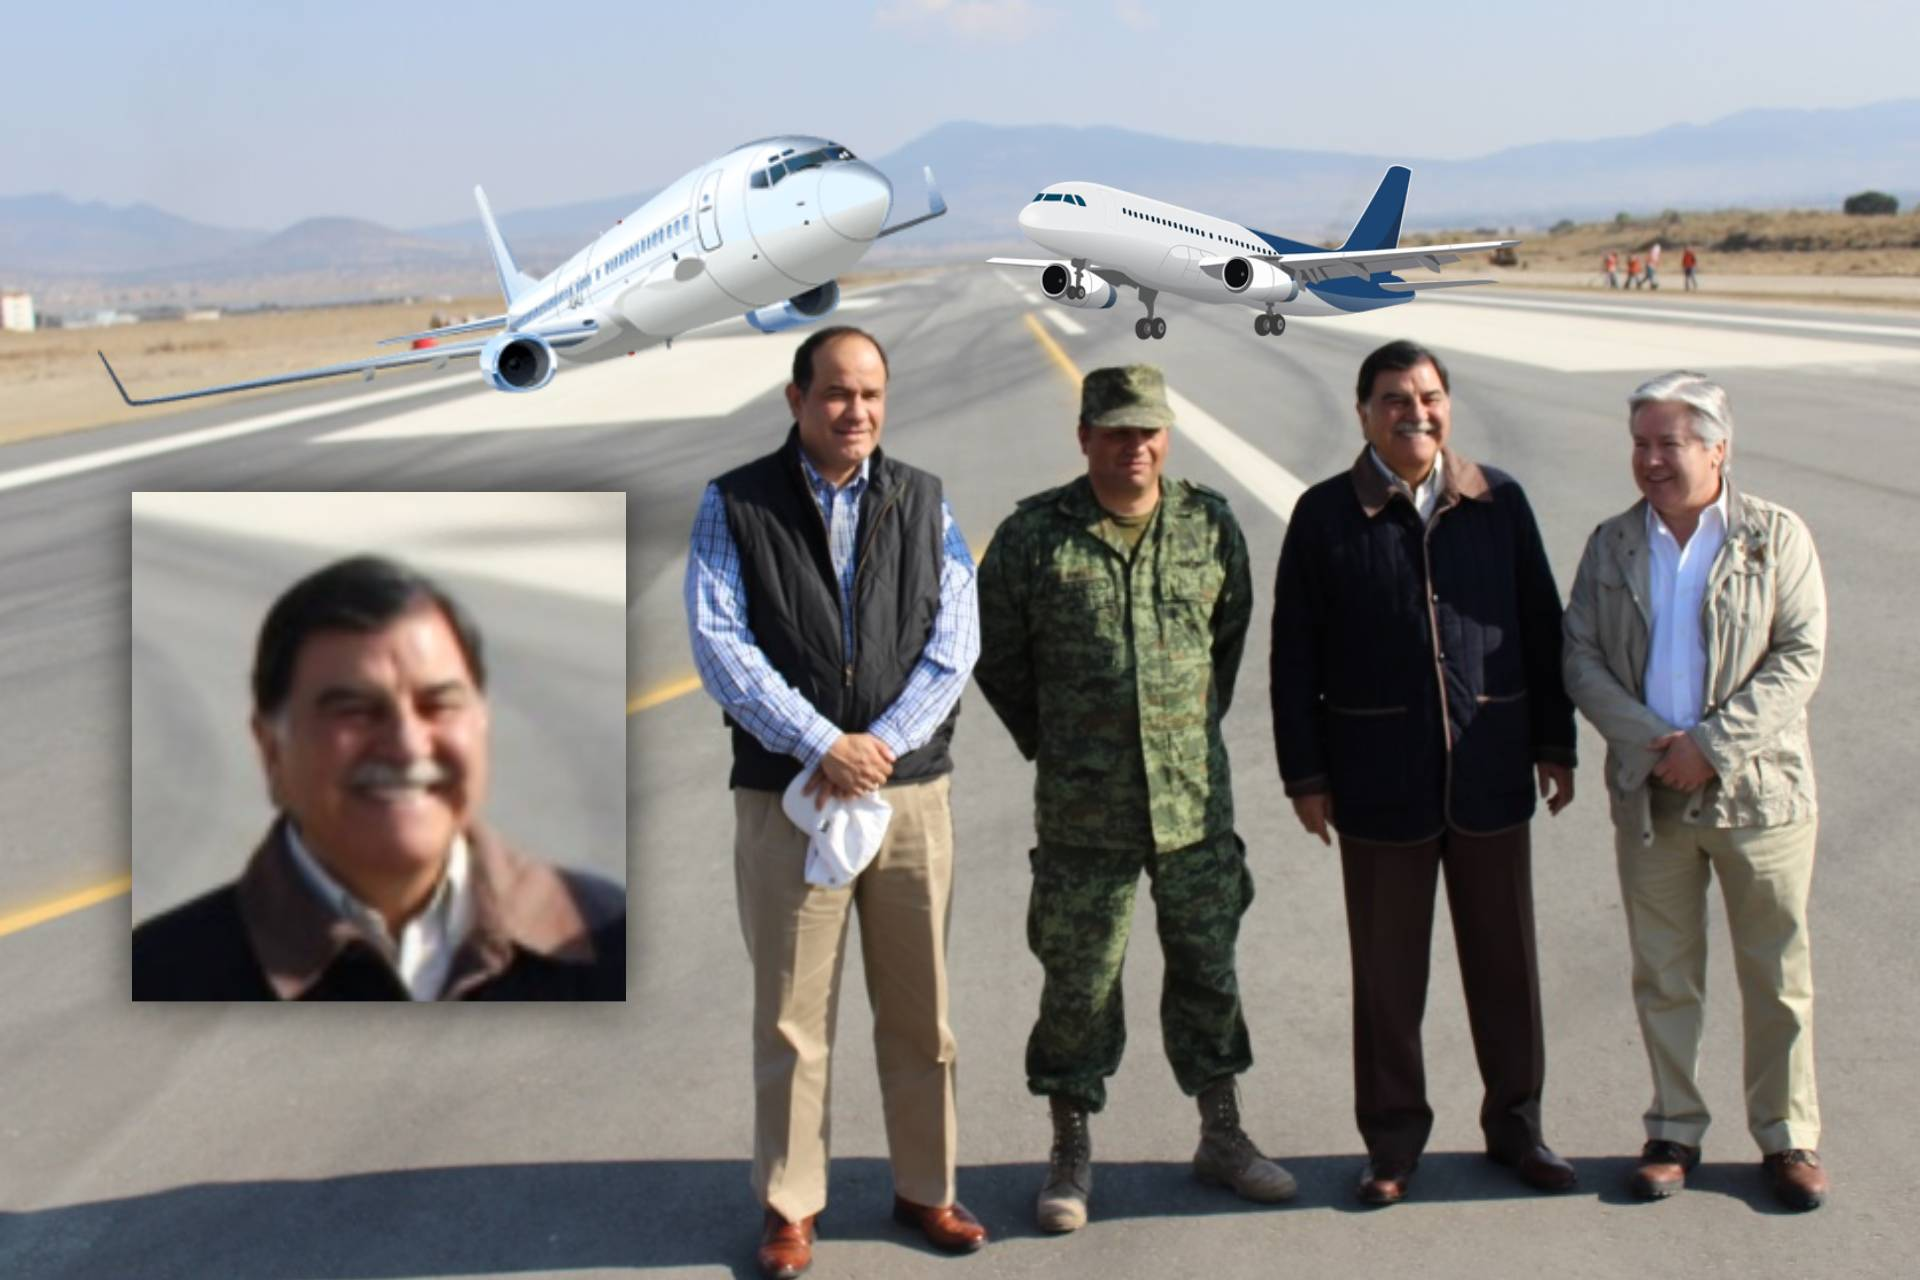 aereopuerto-Atlangatepec-Tlaxcala-Mariano González Zarur-Política